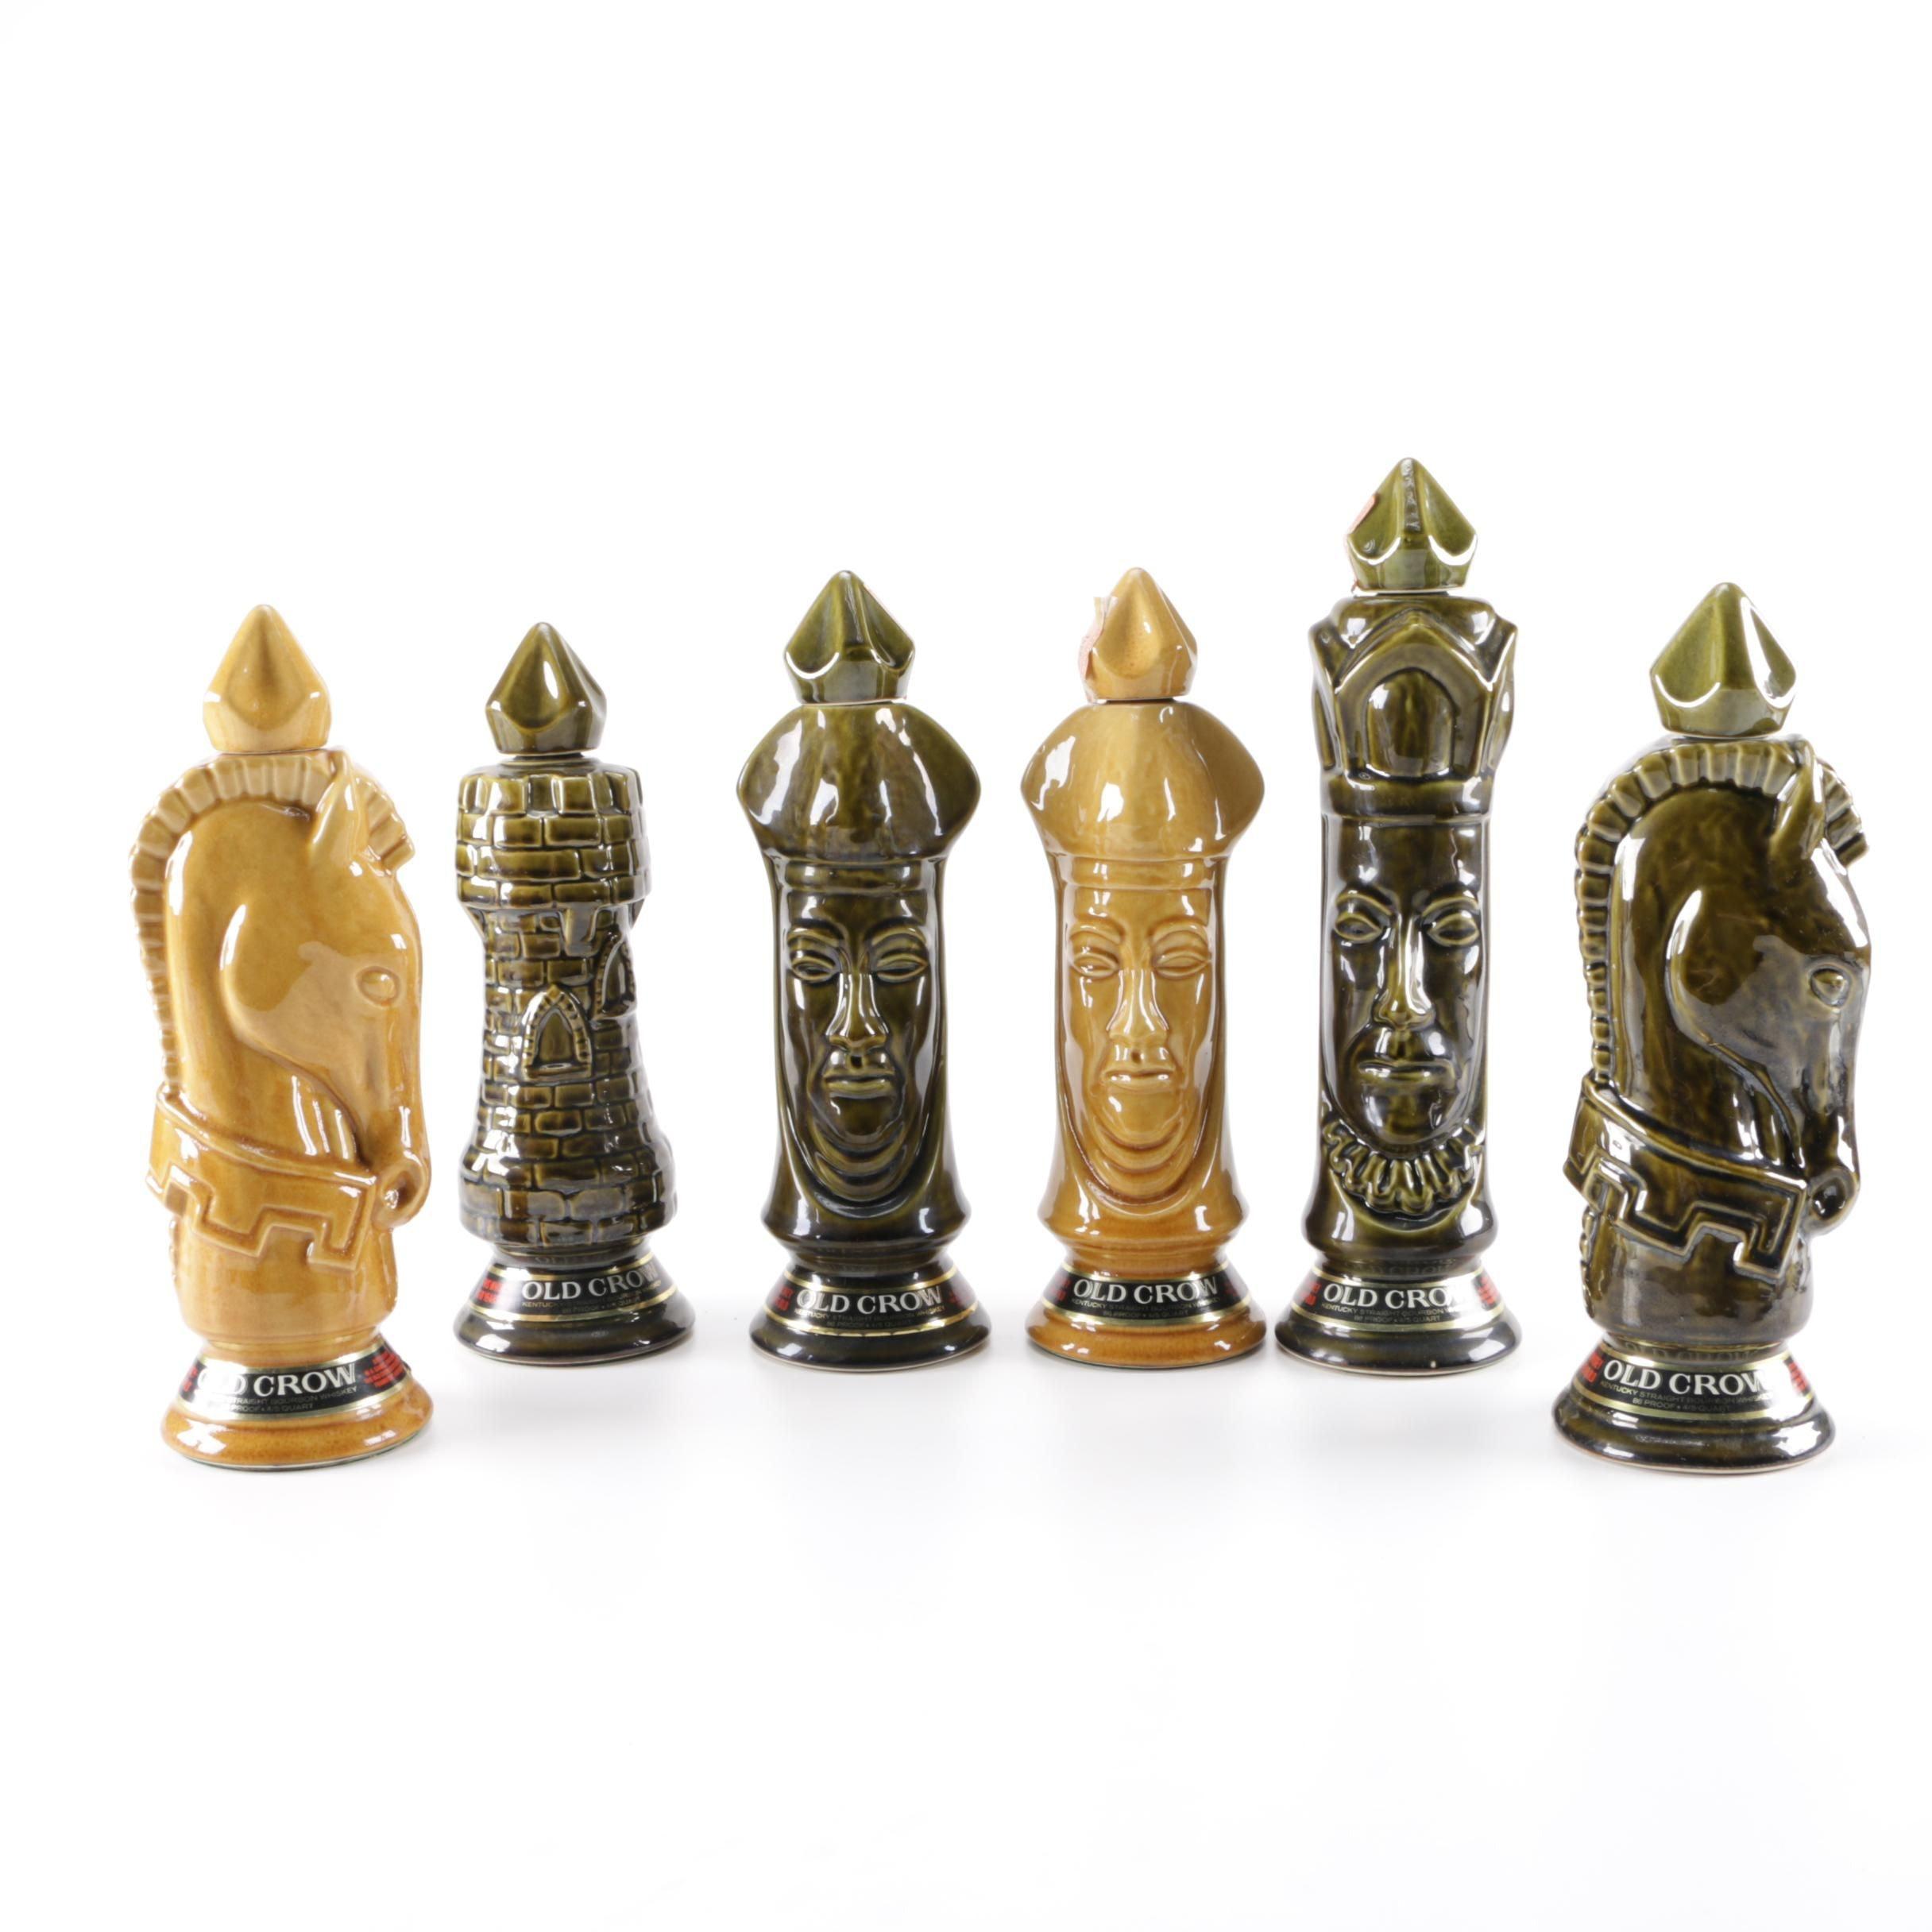 Collection of Old Crow Chessmen Ceramic Kentucky Bourbon Whiskey Bottles